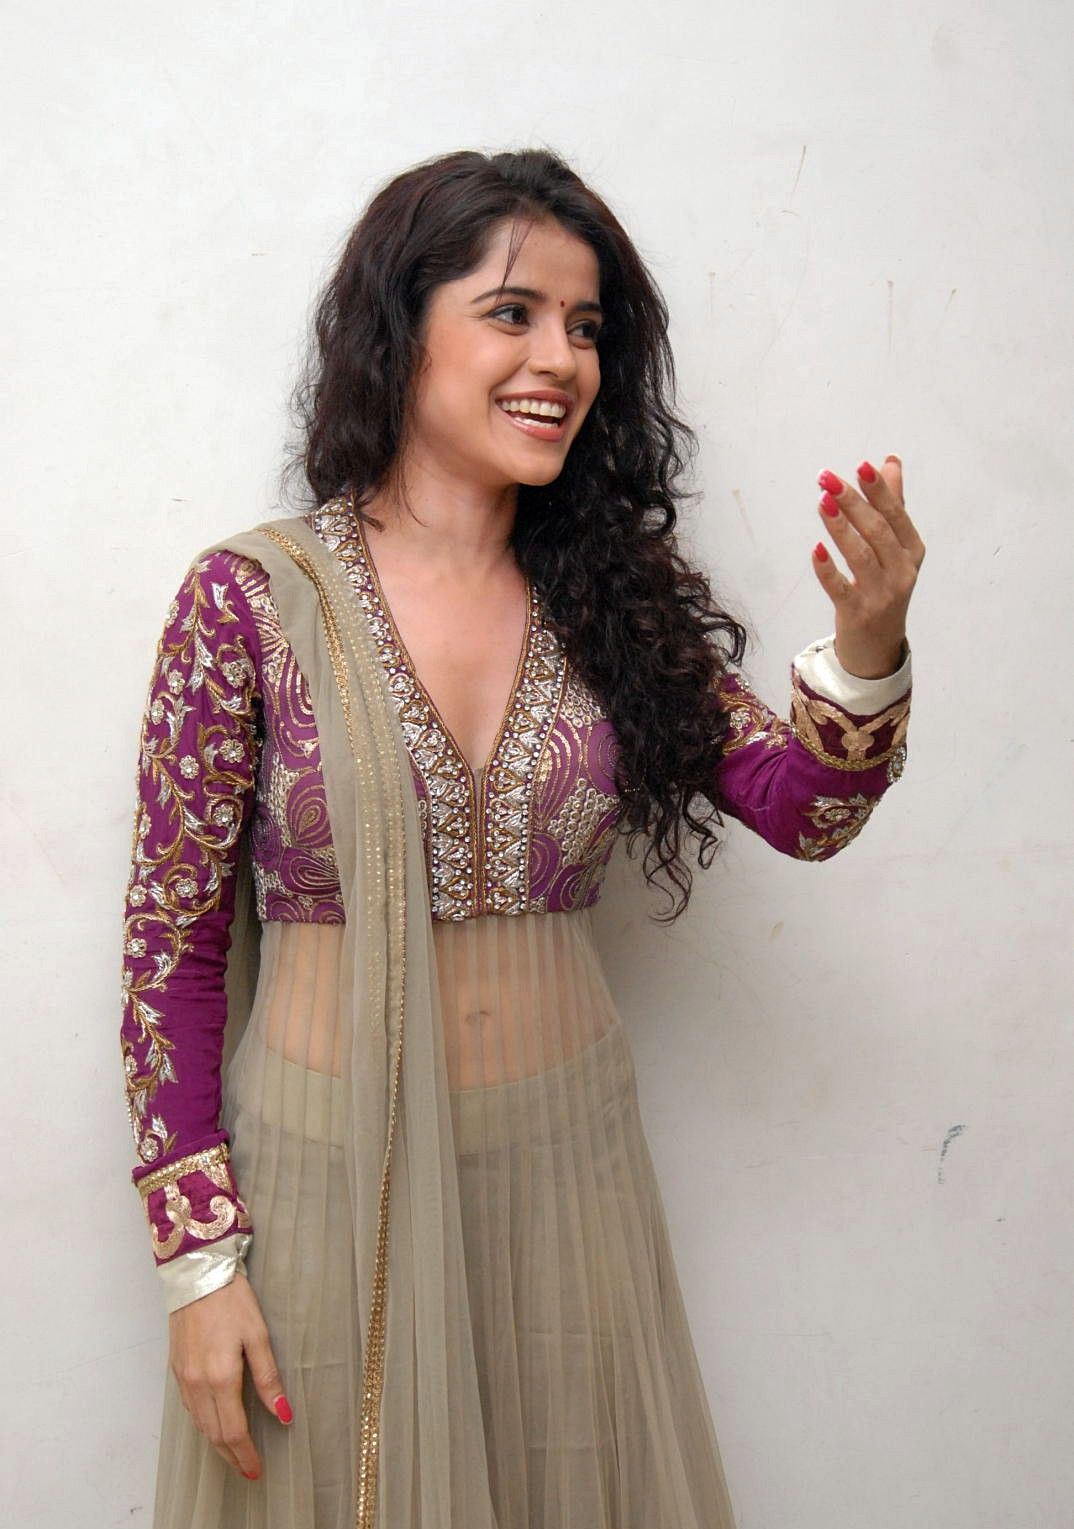 Piaa bajpai transparent gahgra choli spicy innocent beauty beautiful pics